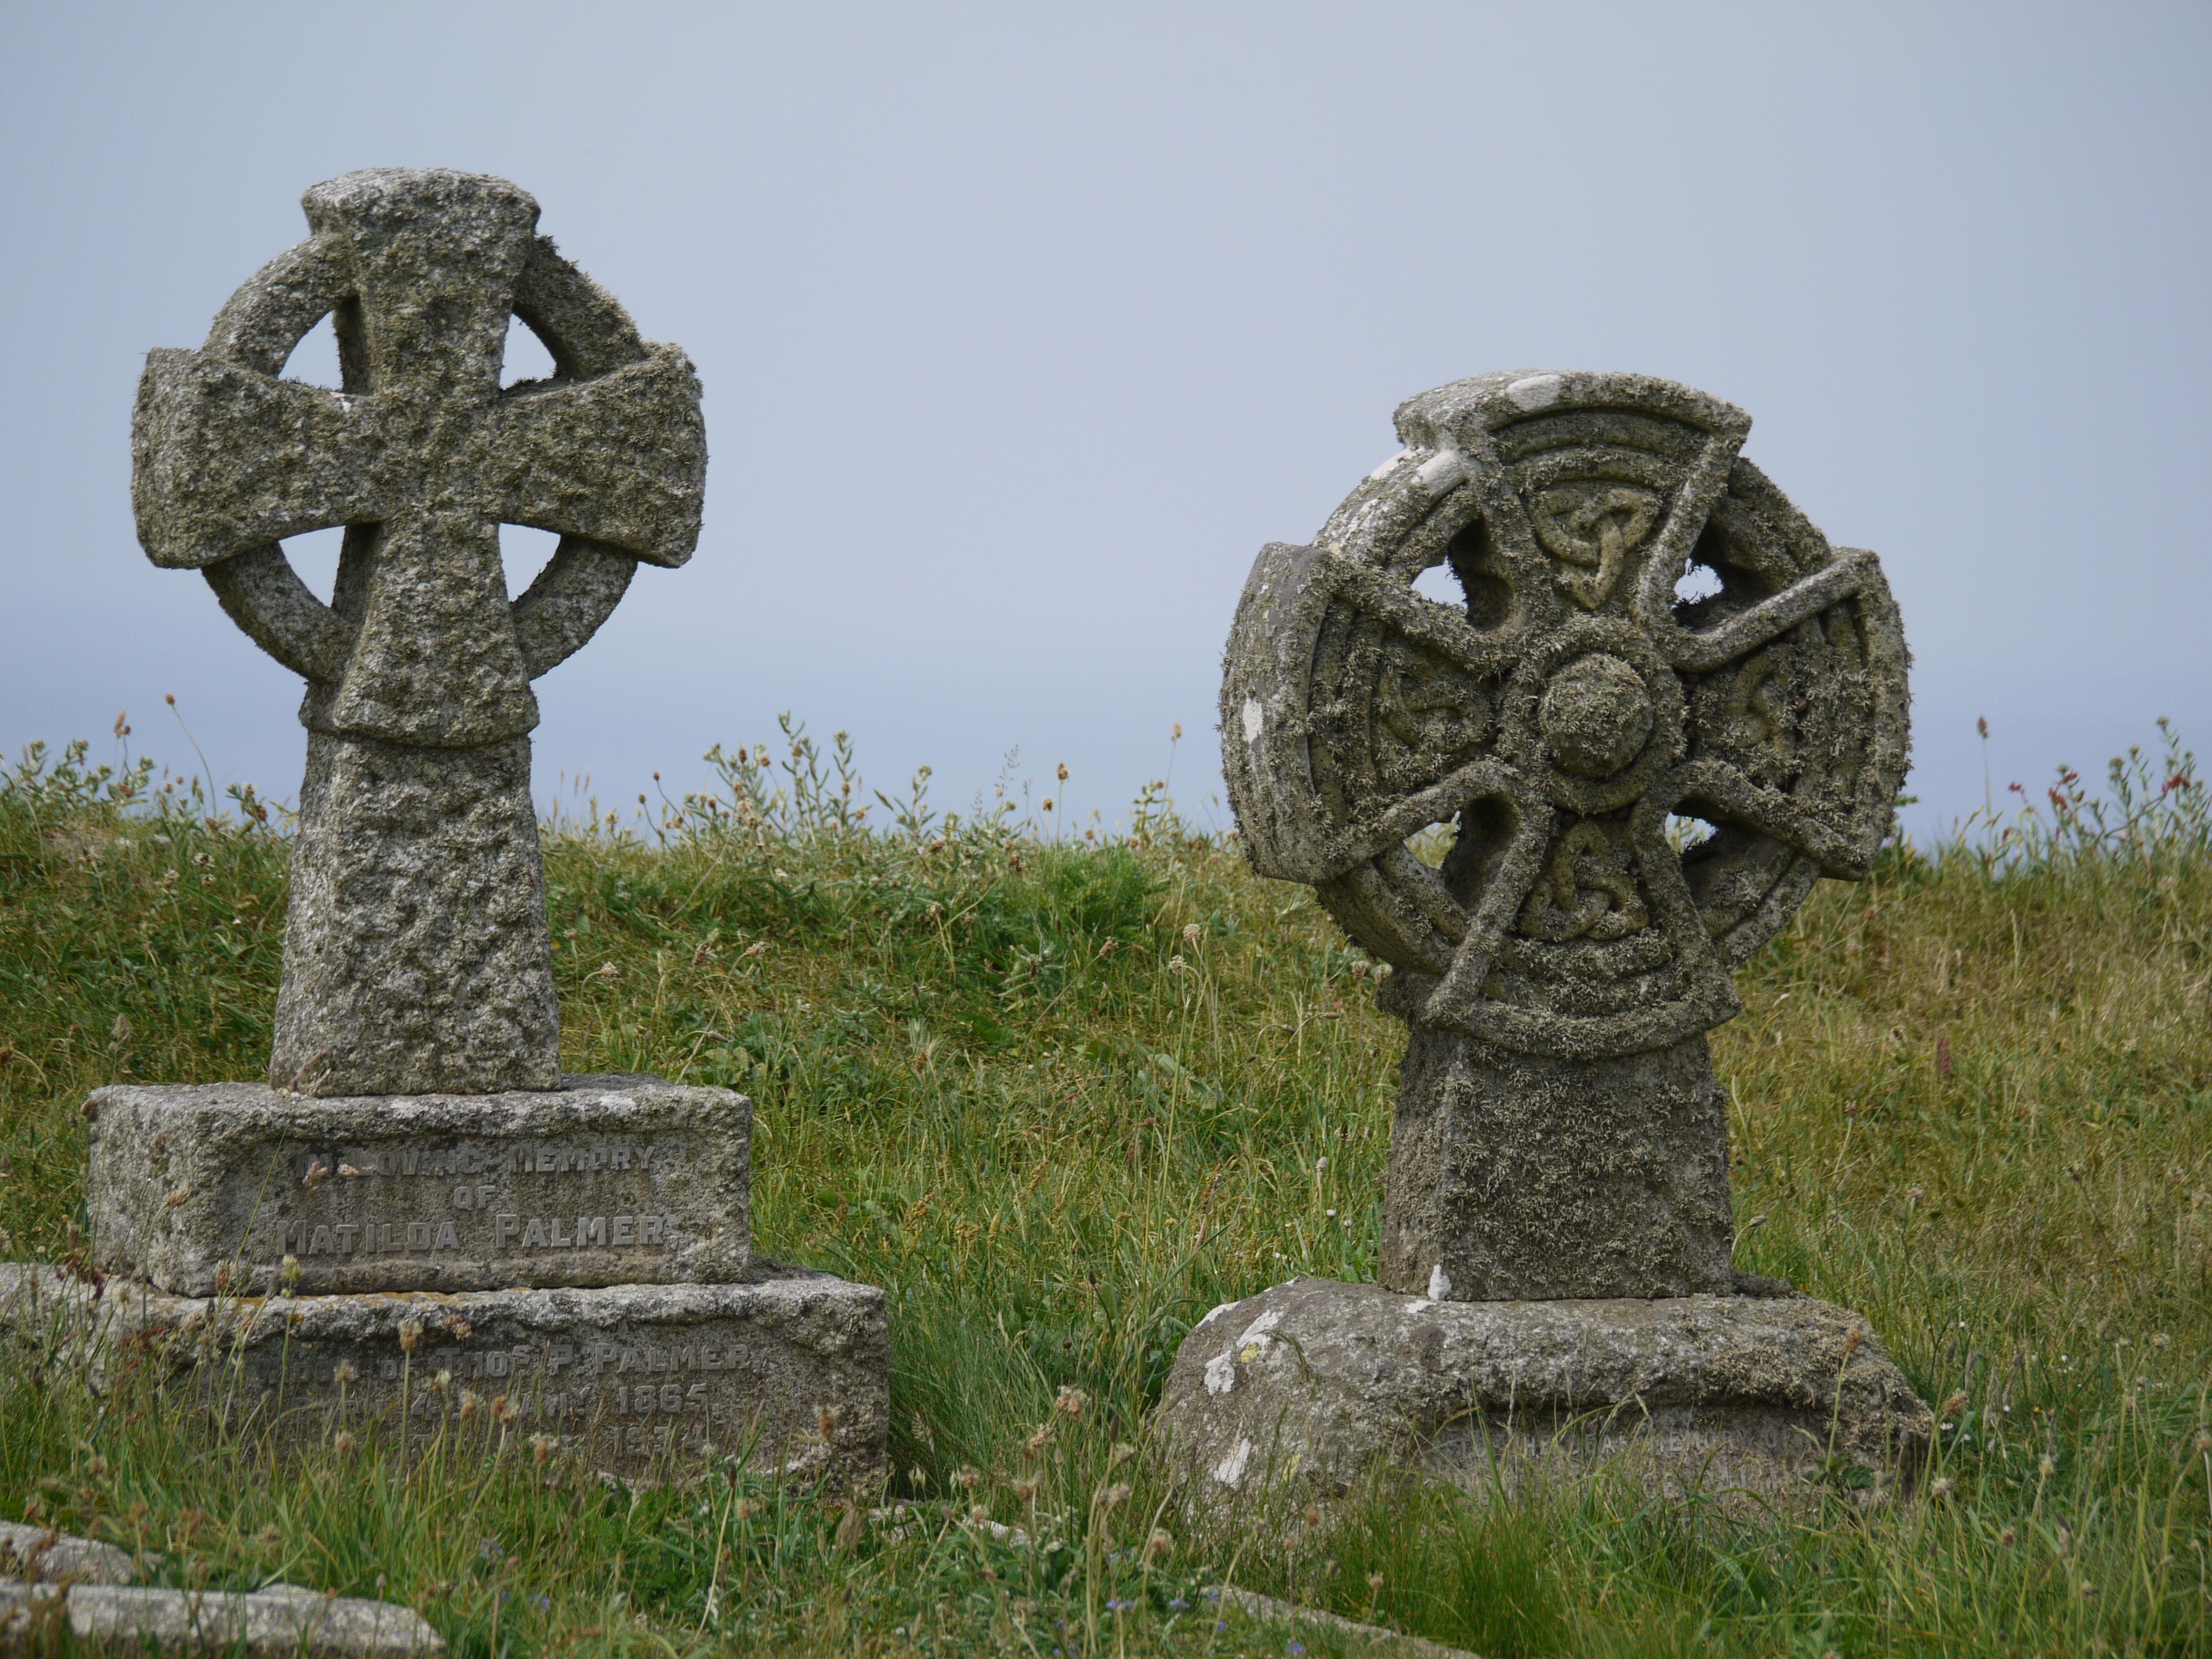 Httpsgetpxherecomphotoroofoldstoneovergr - Celtic religion